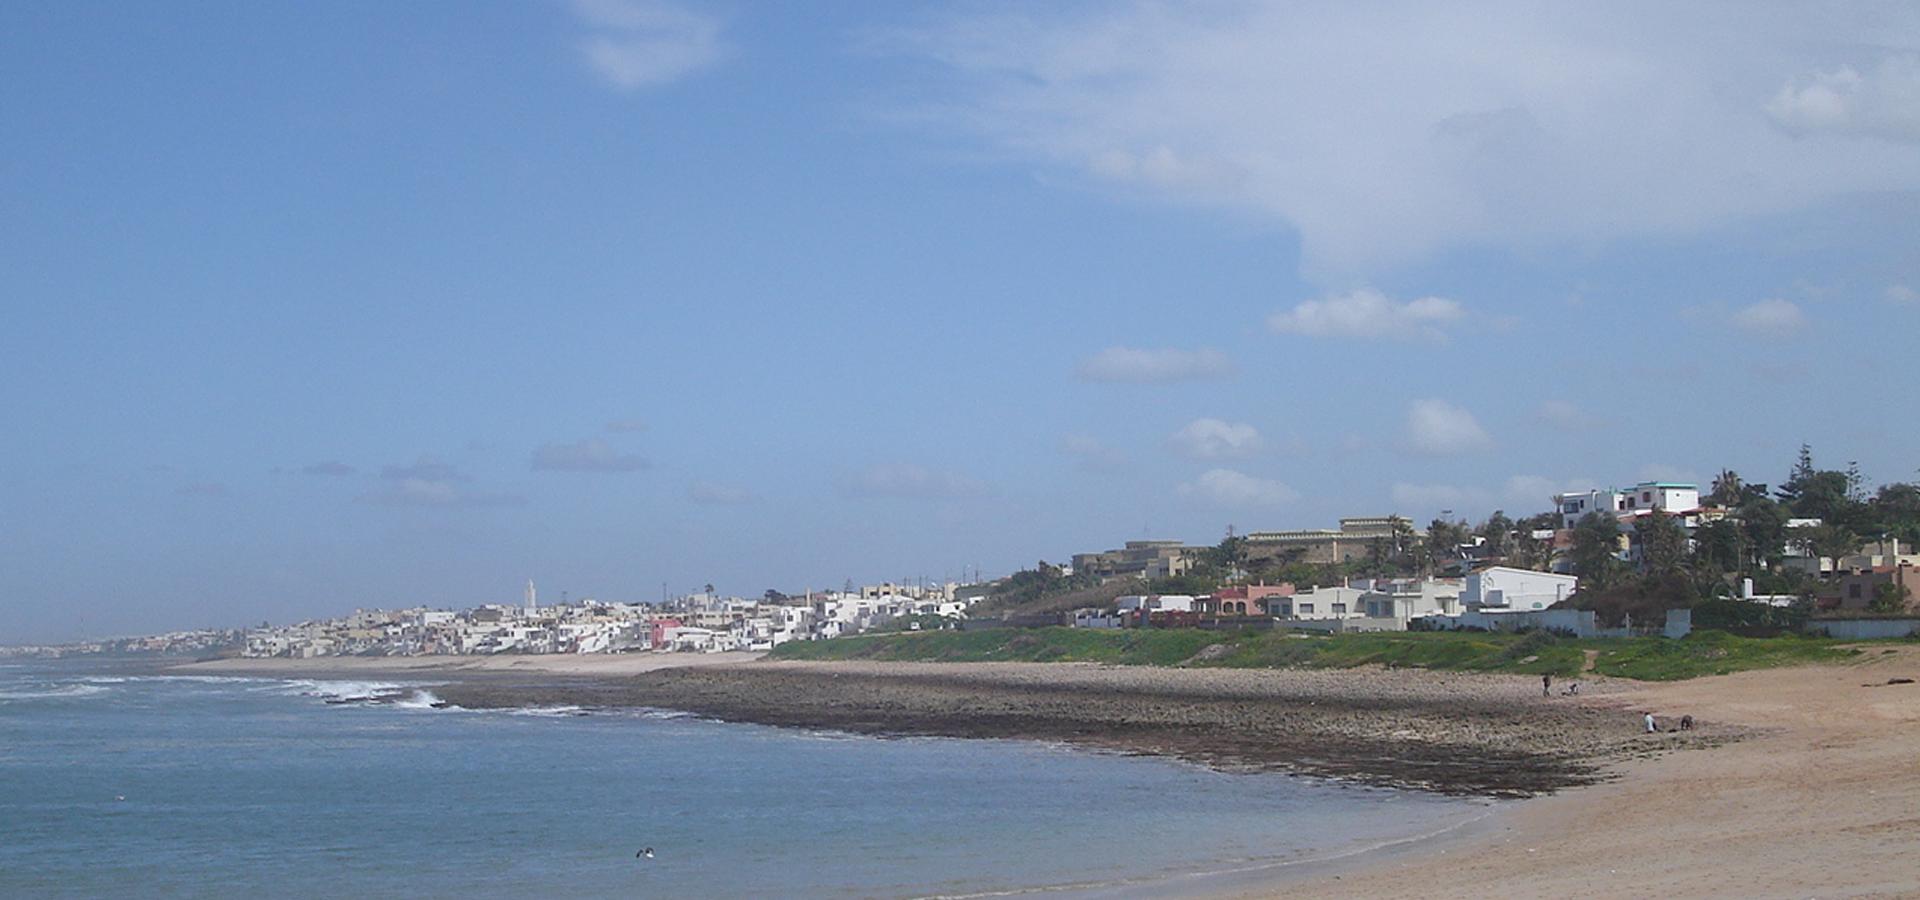 <b>Temara, Skhirate-Témara Prefecture, Rabat-Salé-Kénitra Region, Morocco</b>